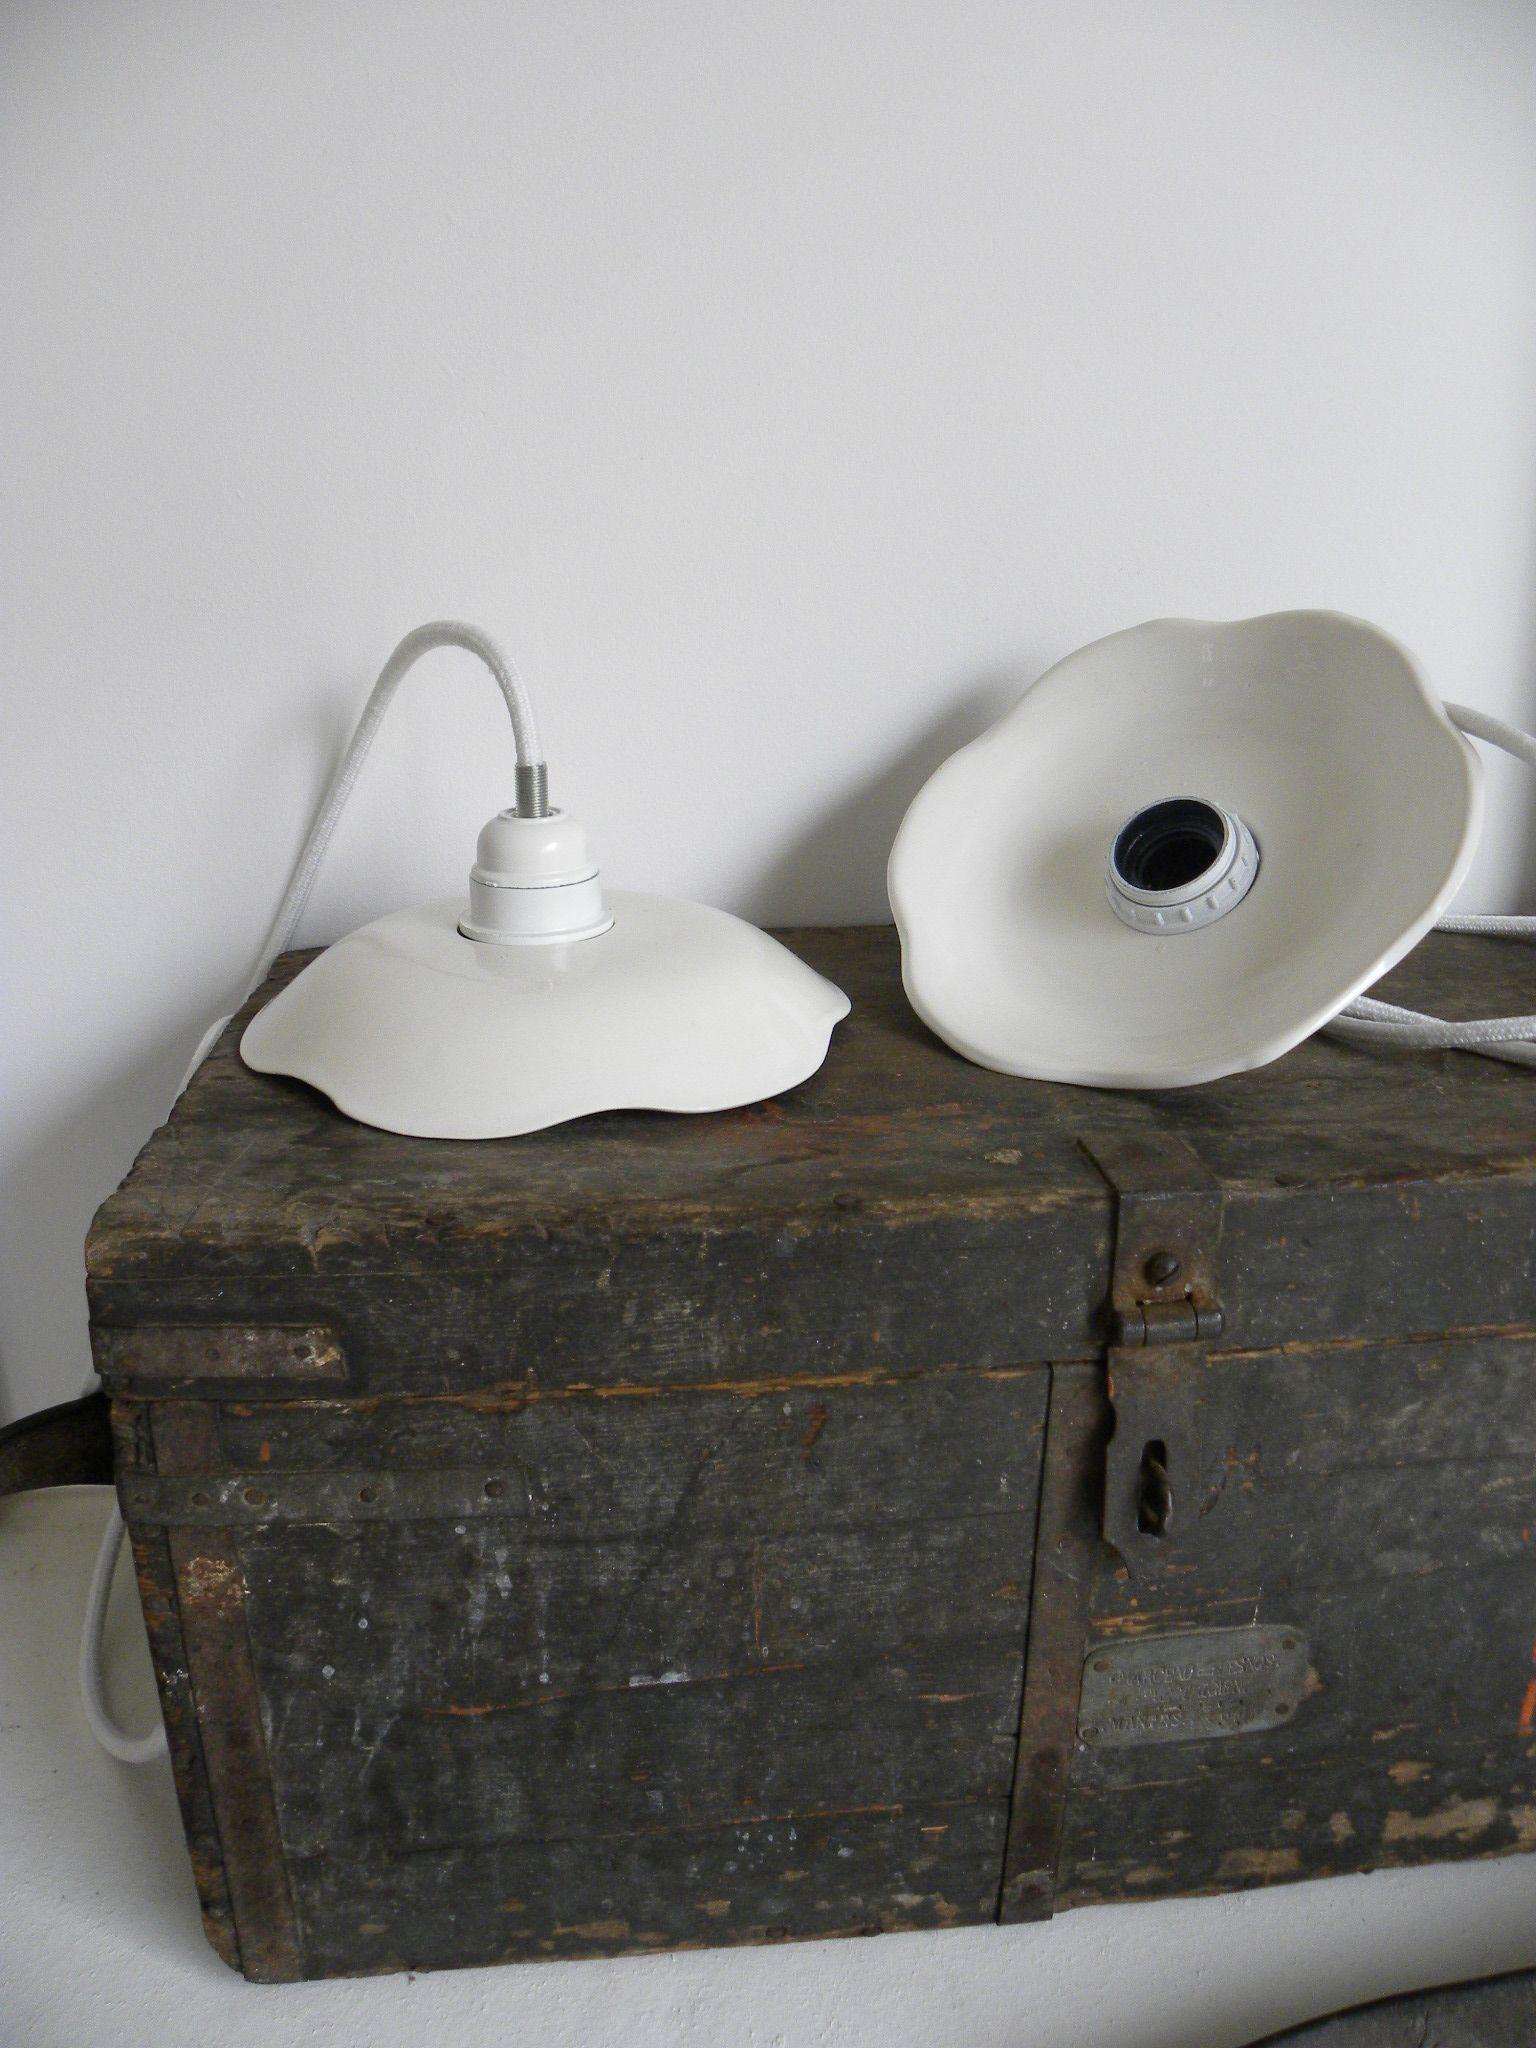 luminaires en céramique home made modeles poterie u